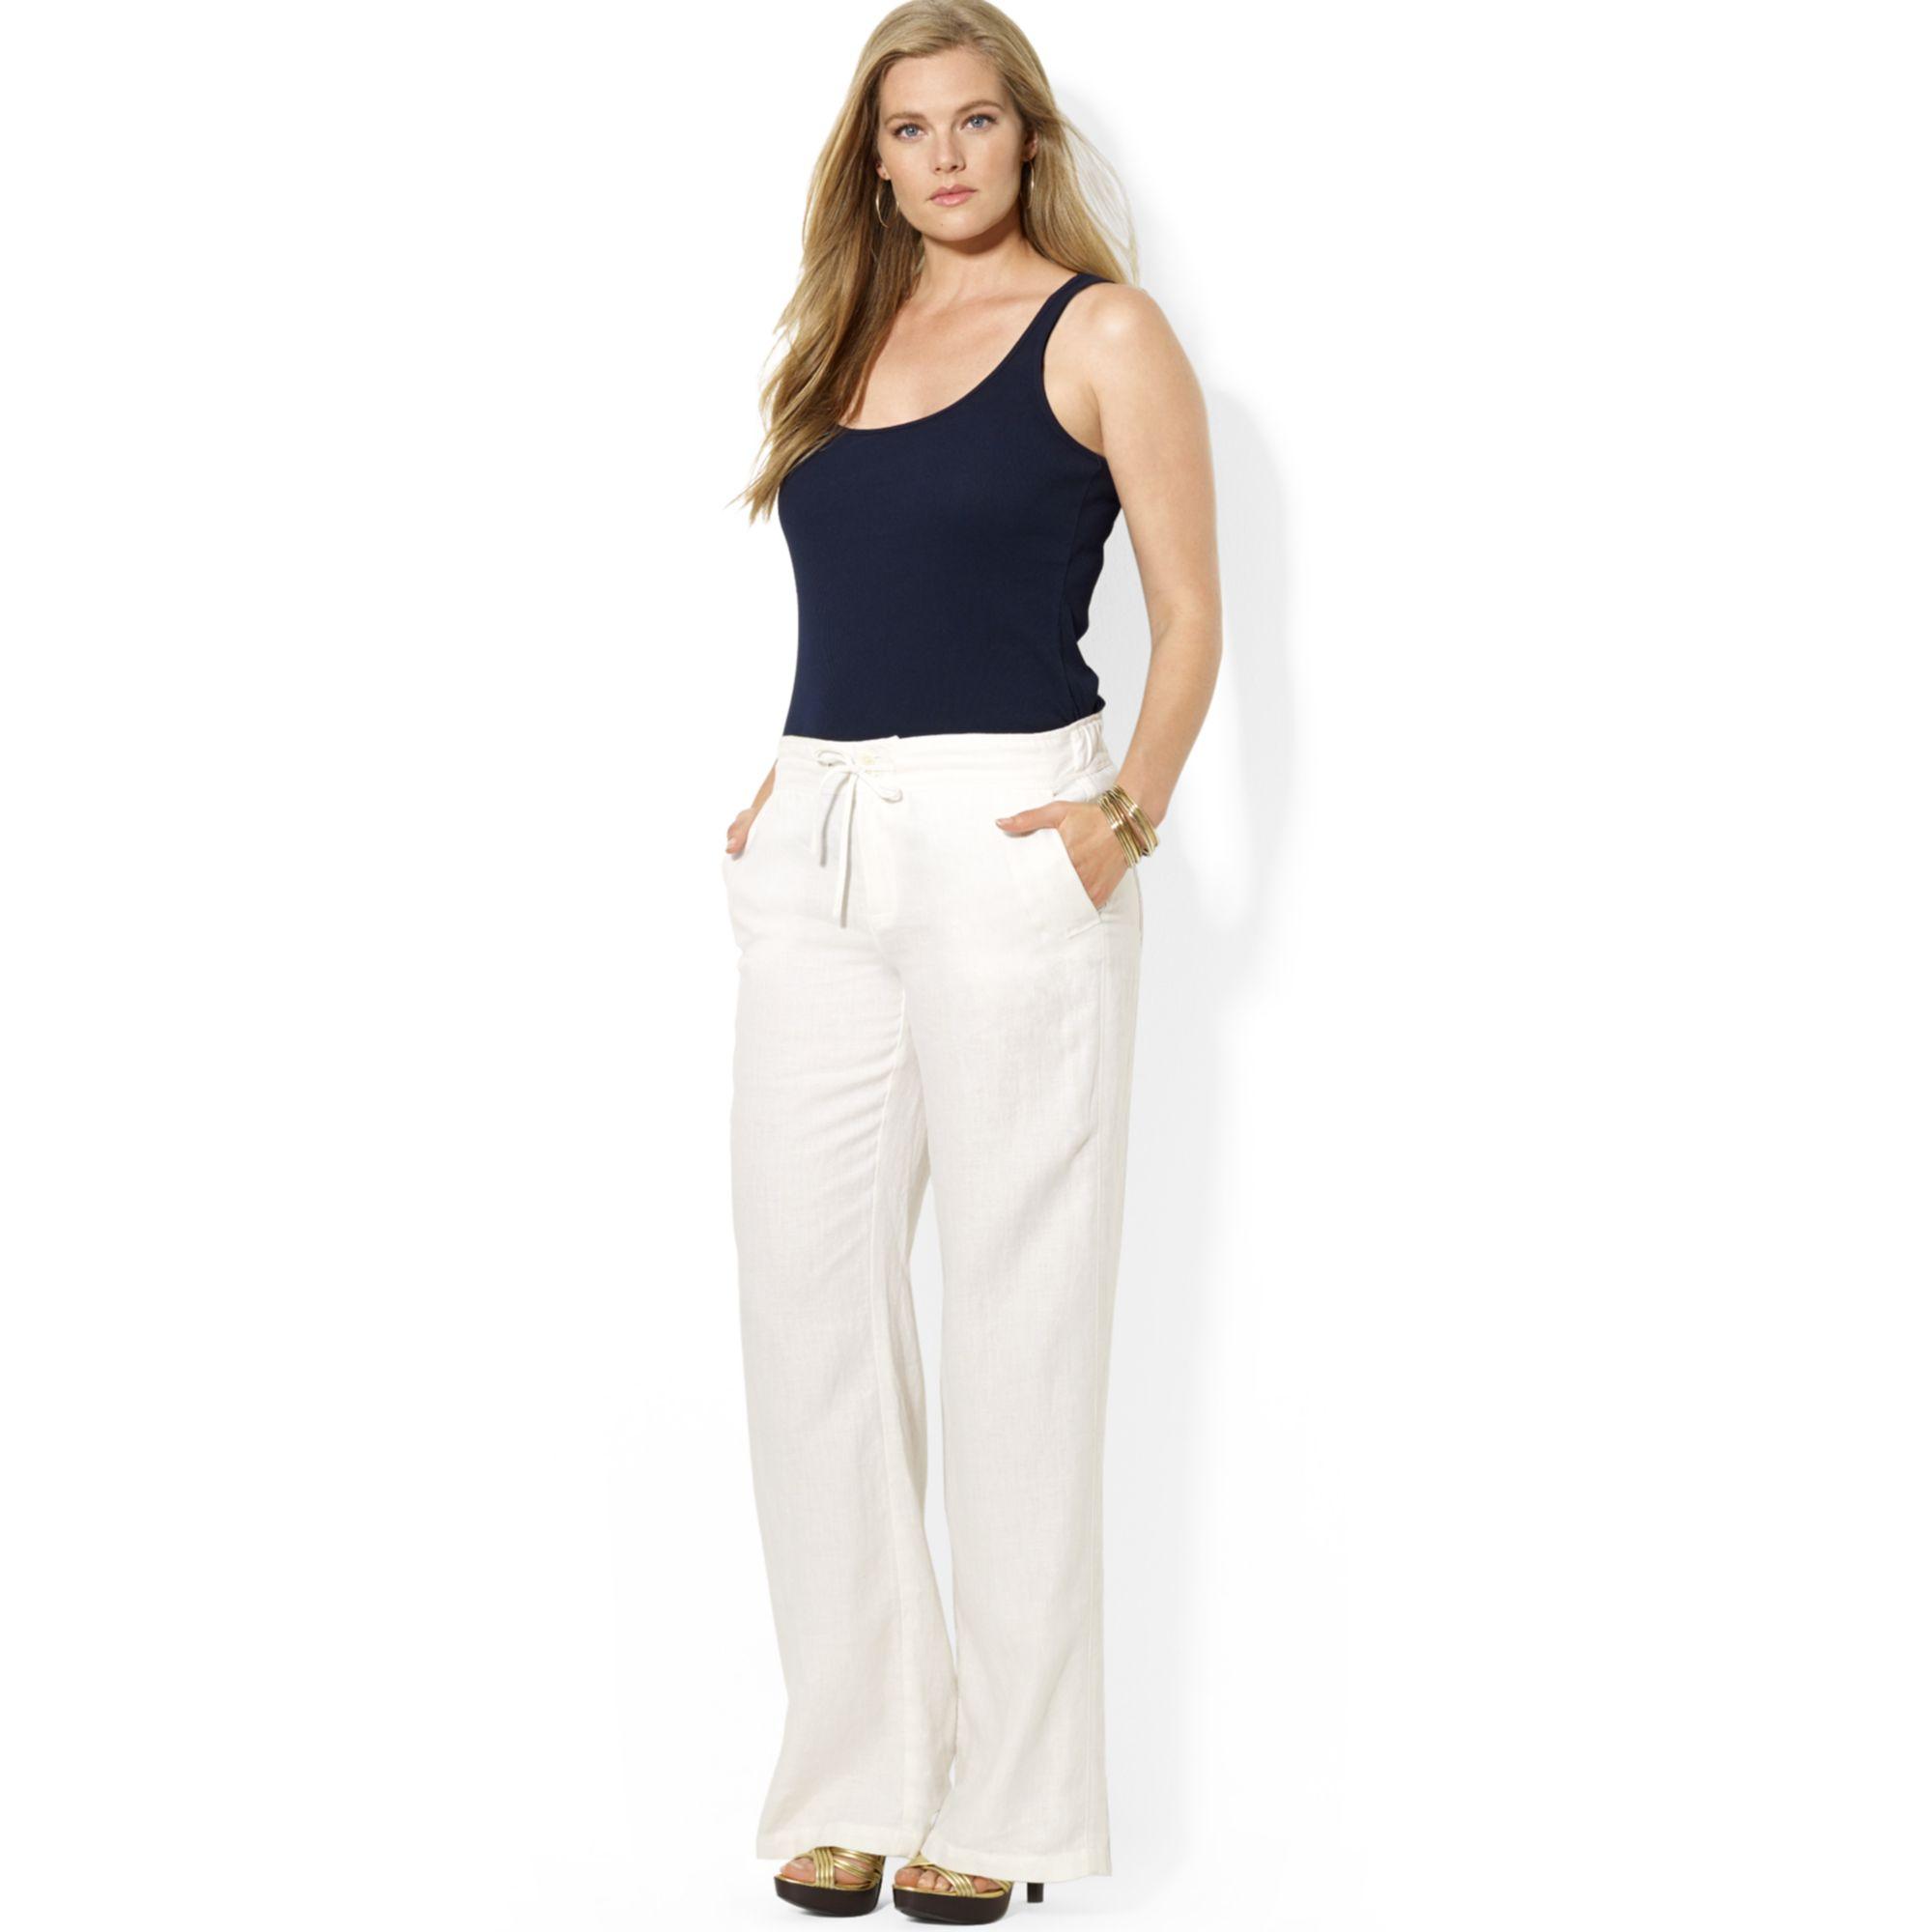 19d7839b7b758 Lyst - Lauren by Ralph Lauren Plus Size Wideleg Linen Pants in White